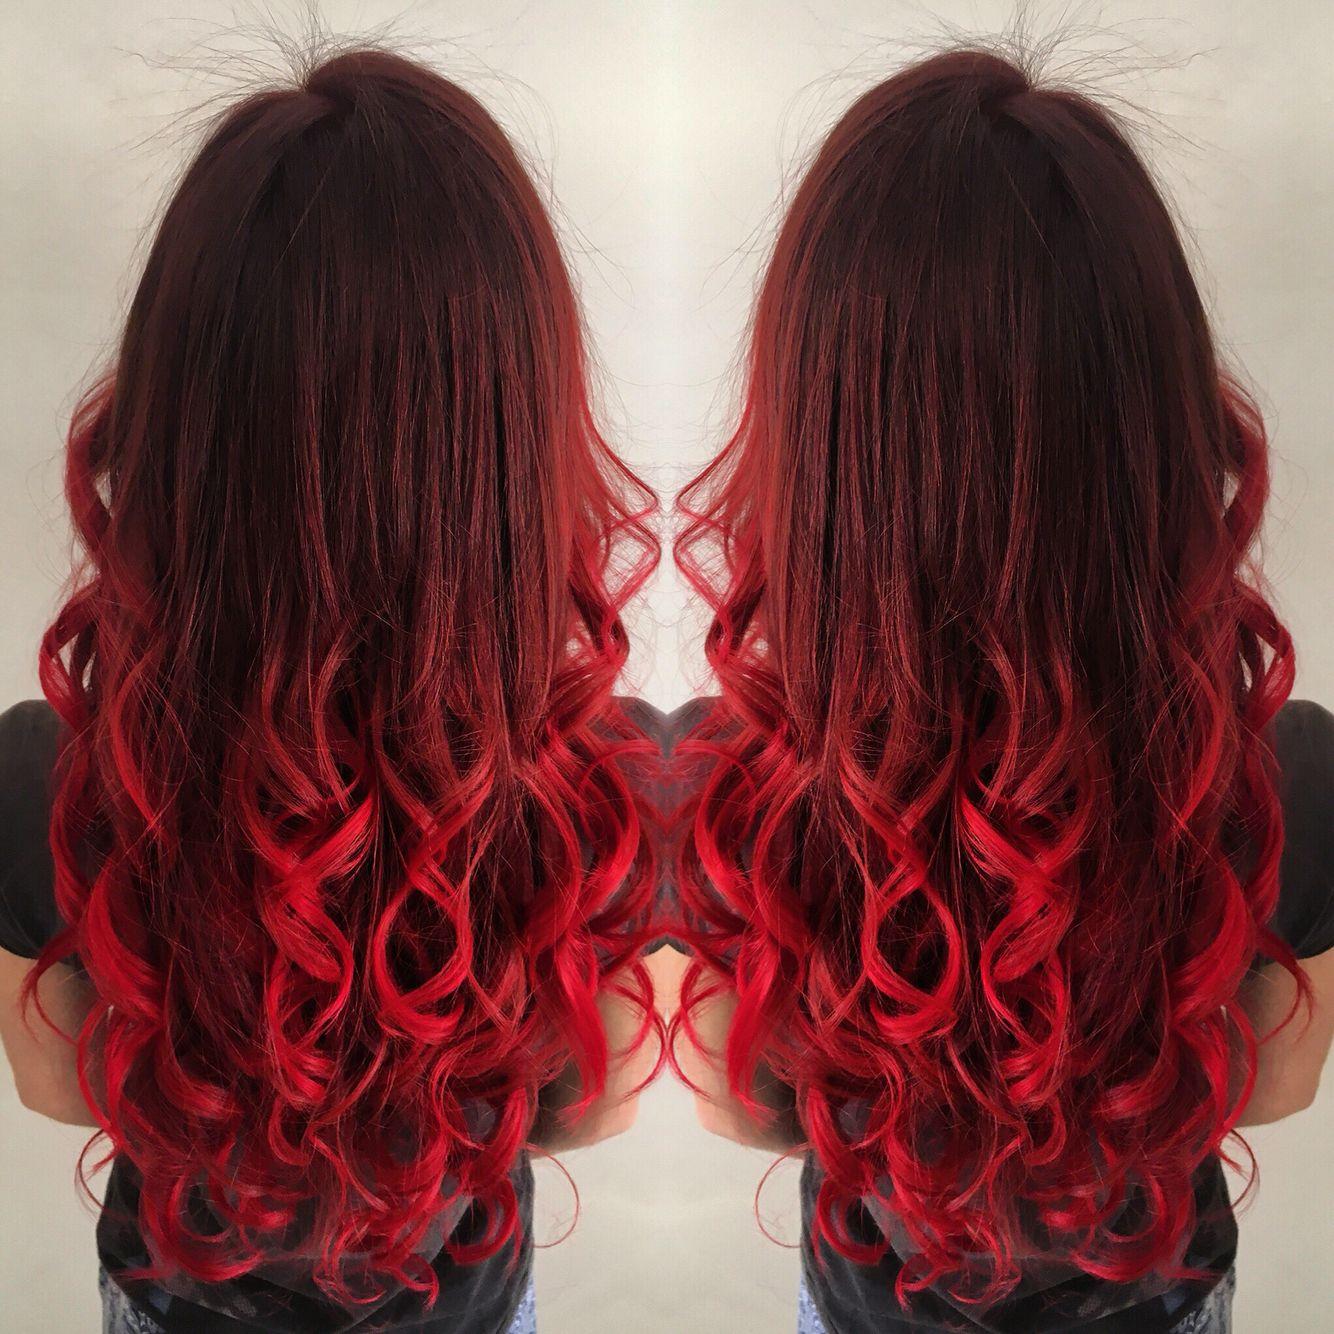 Pin di Cristina su Only my hair Style   Sfumature, Colori